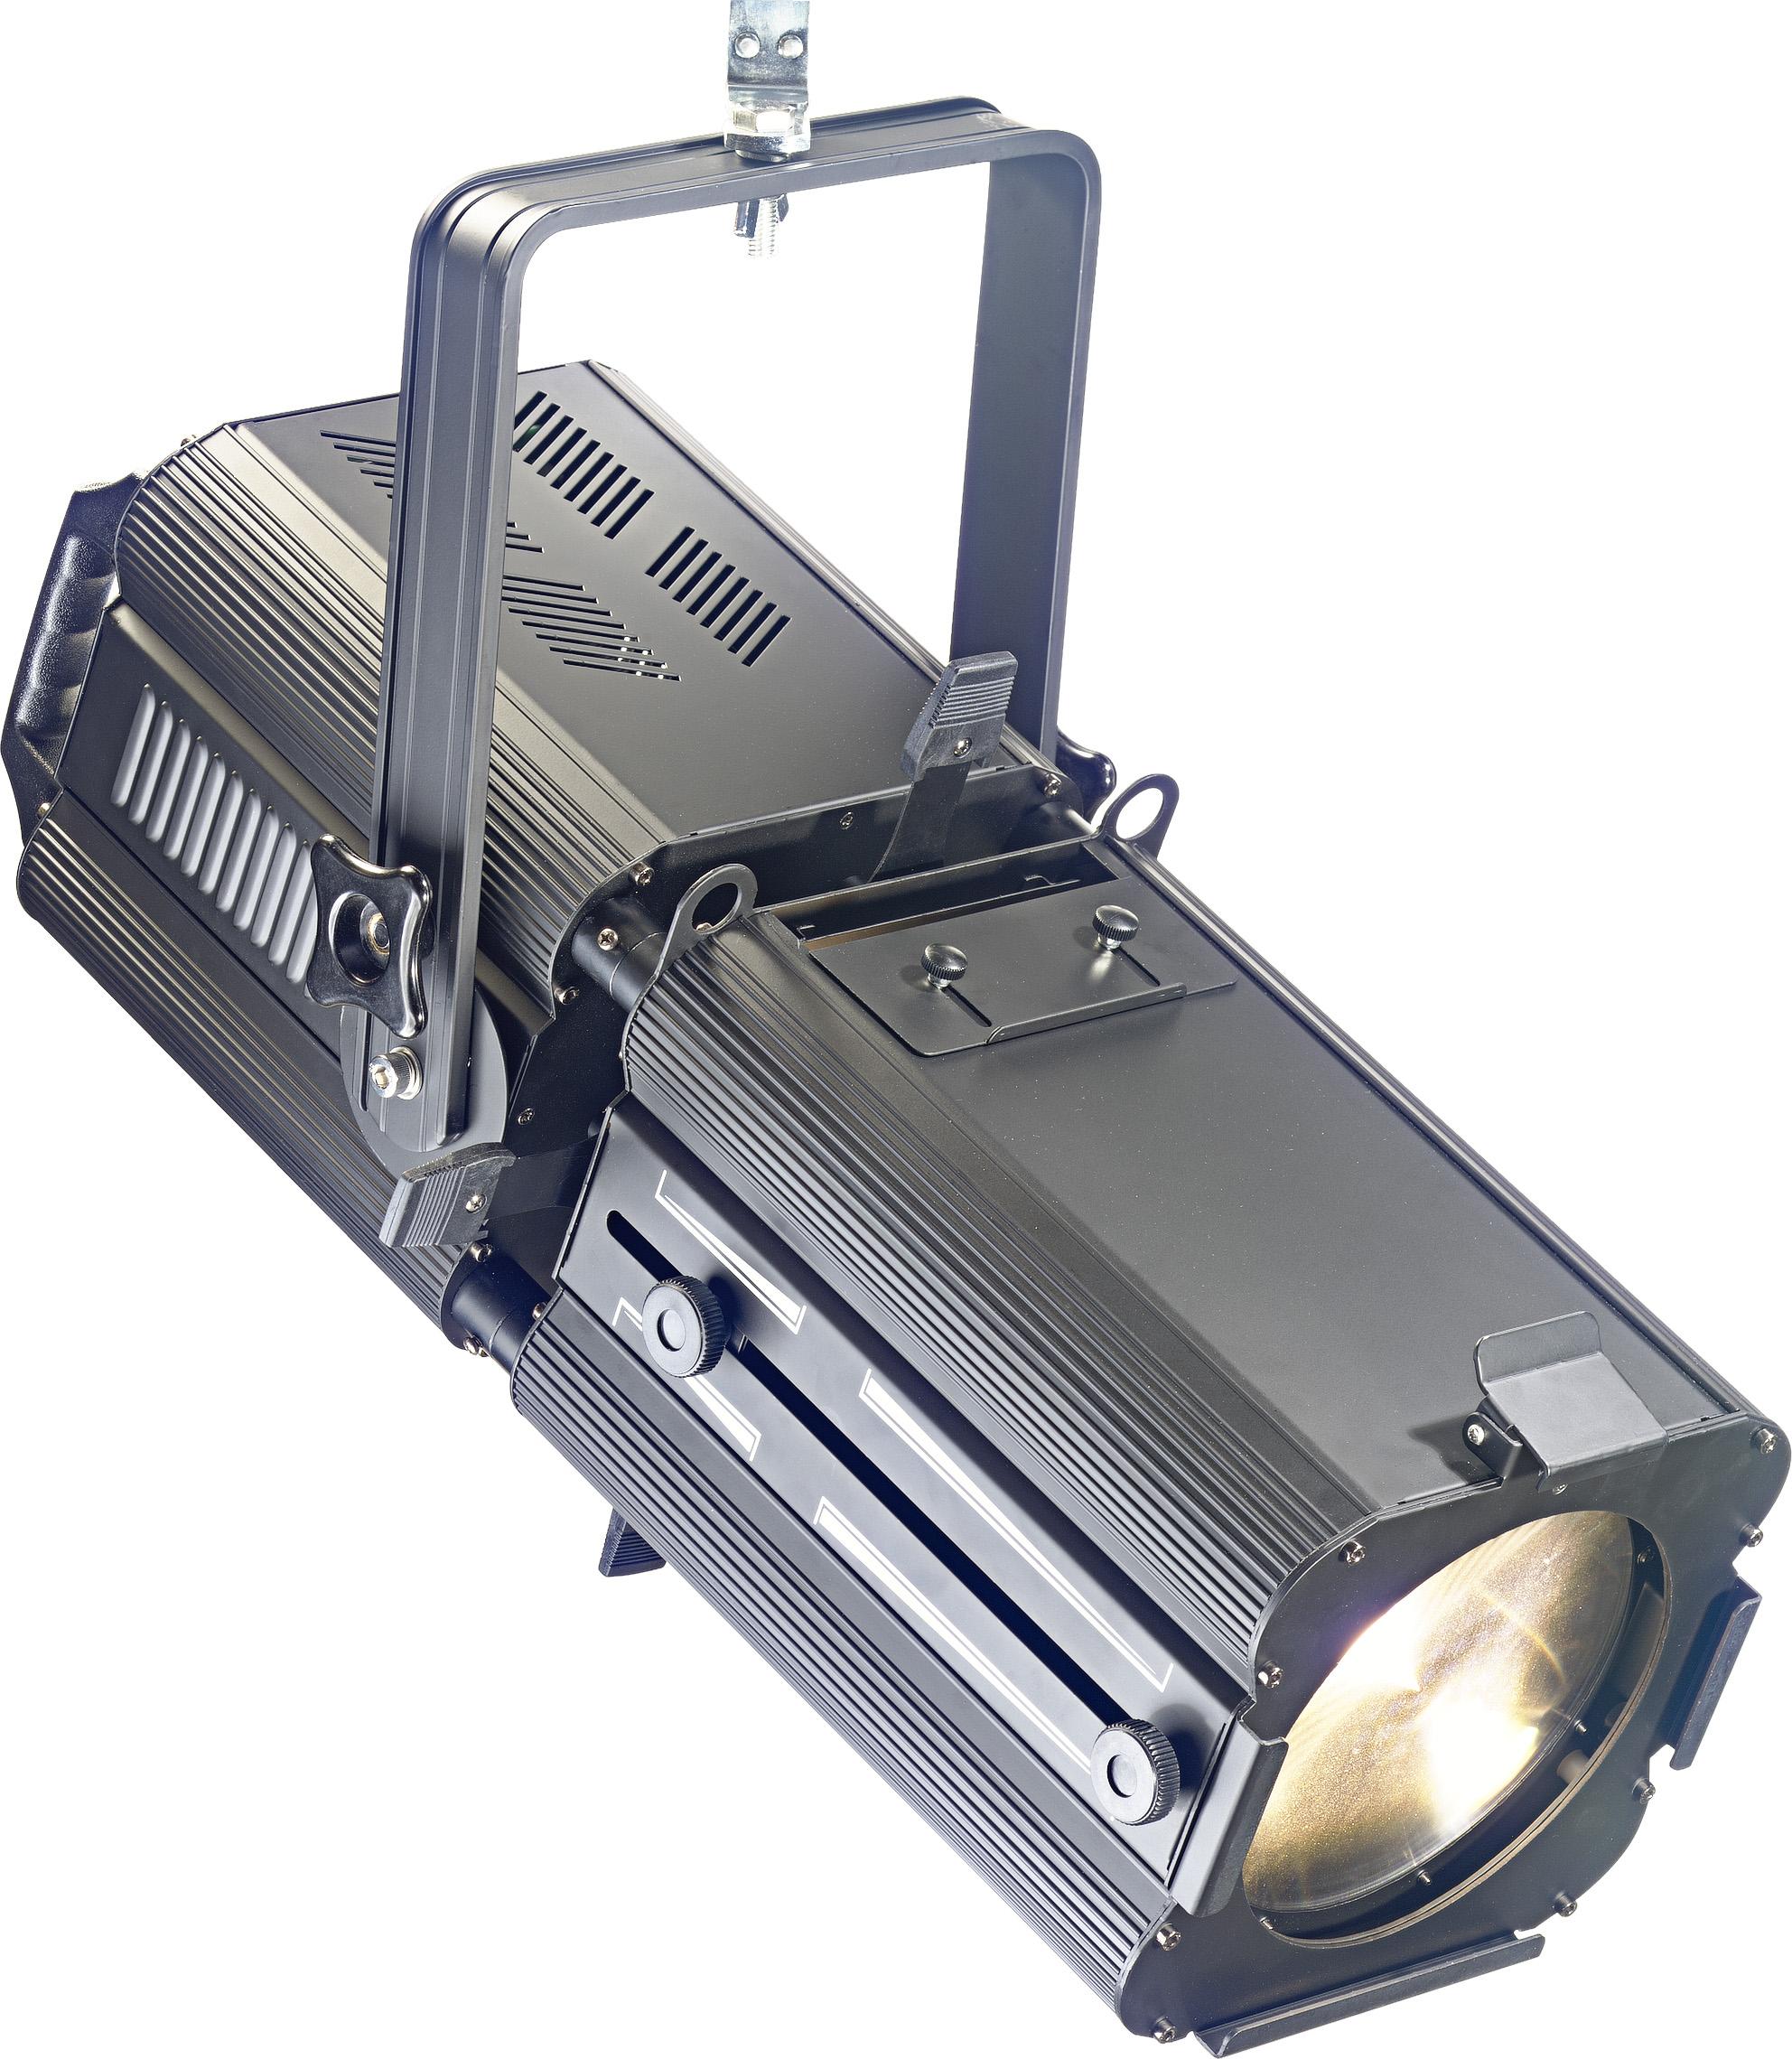 Stagg SLP200Z divadelní reflektor, 1x200W COB 3200K DMX, 17° - 50°